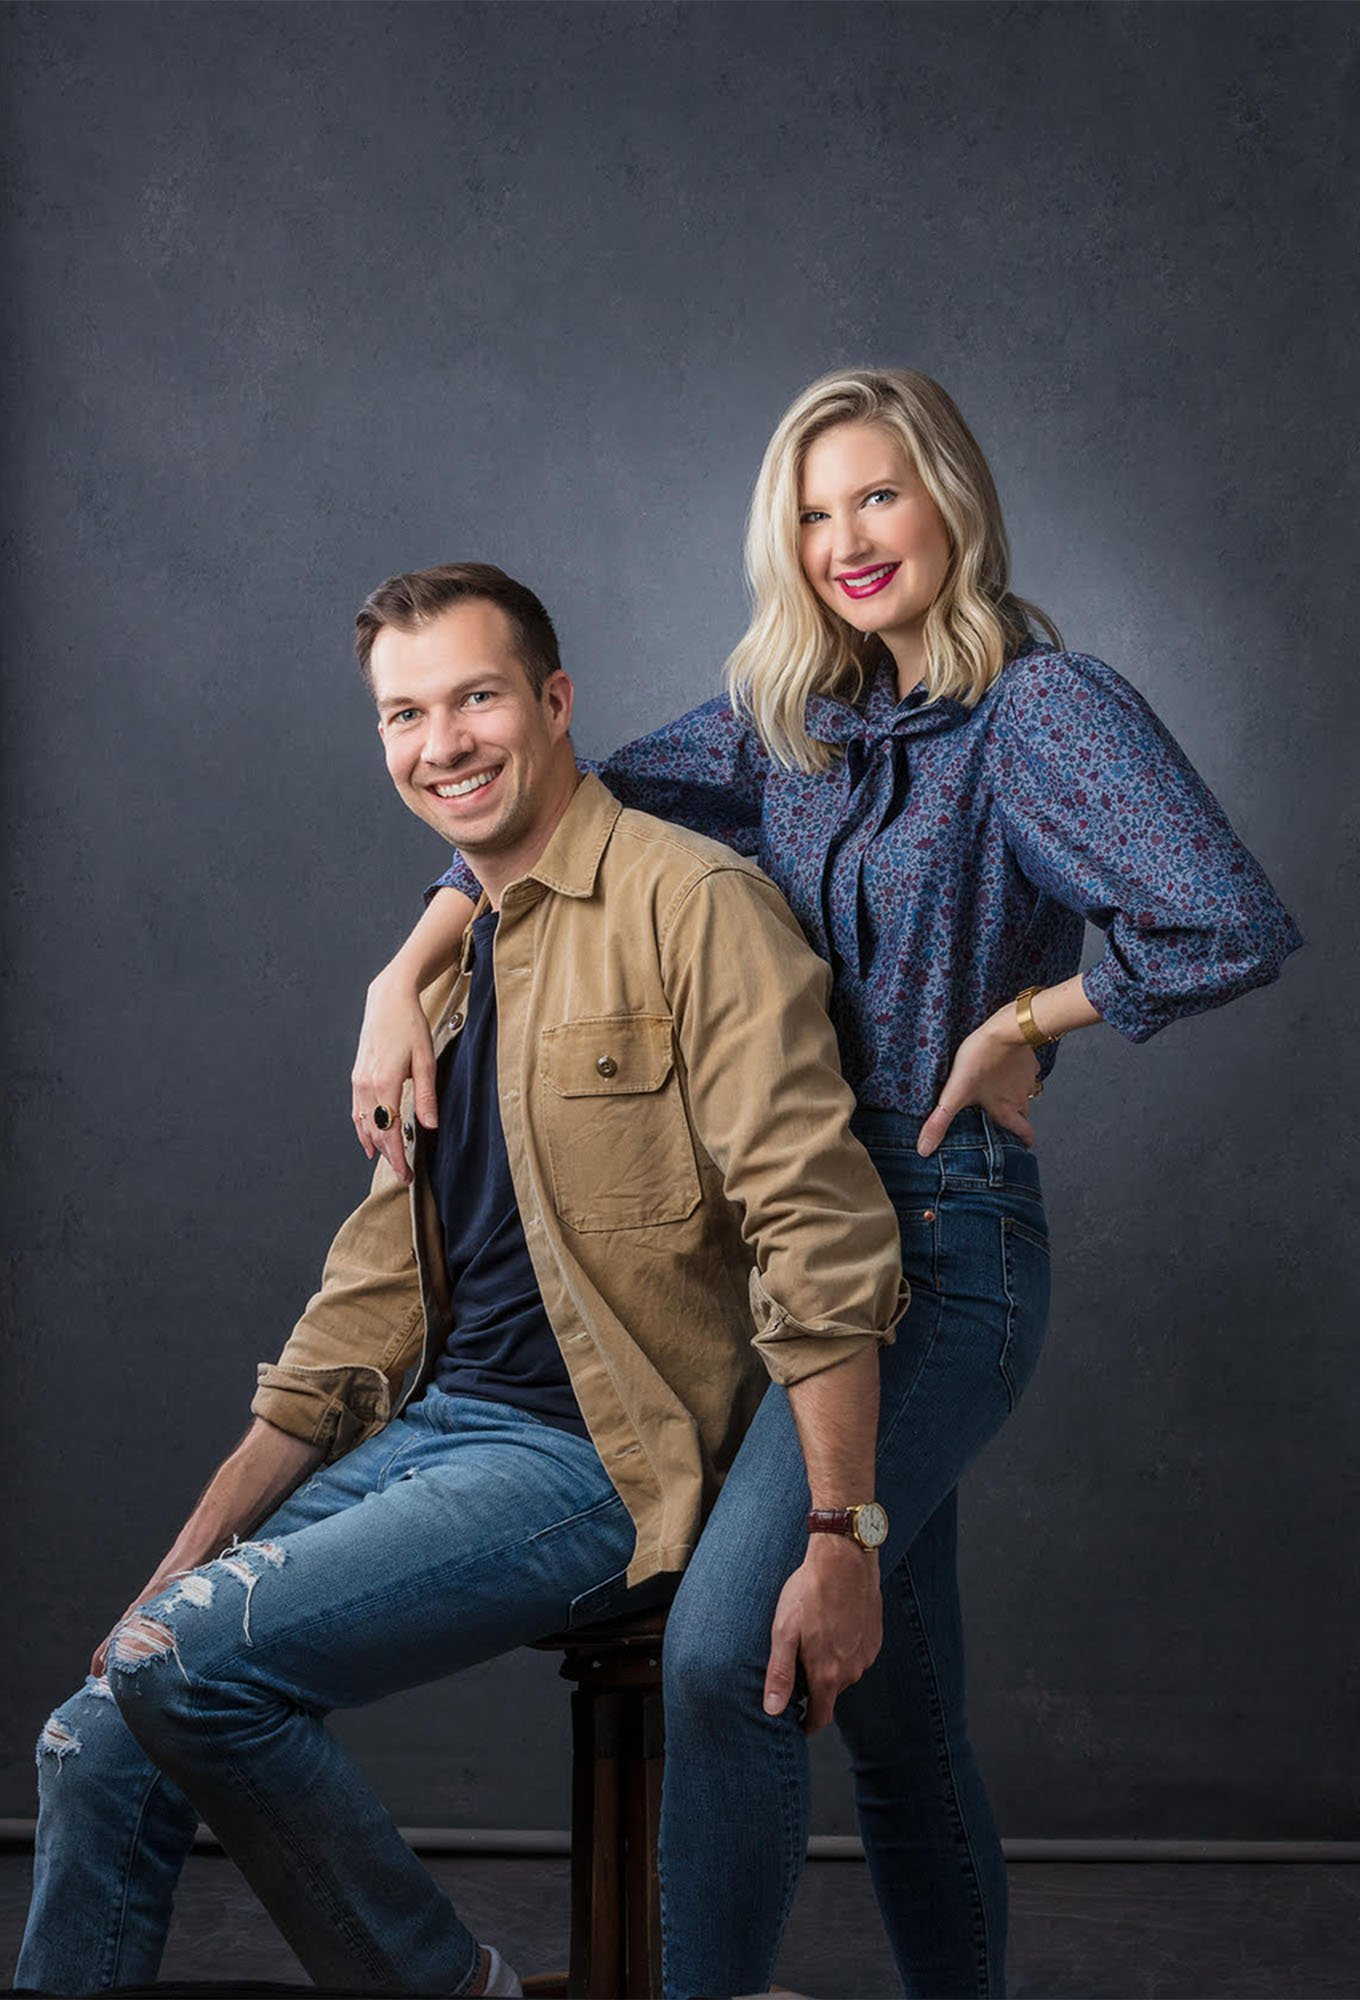 Our 2019 Studio Portraits